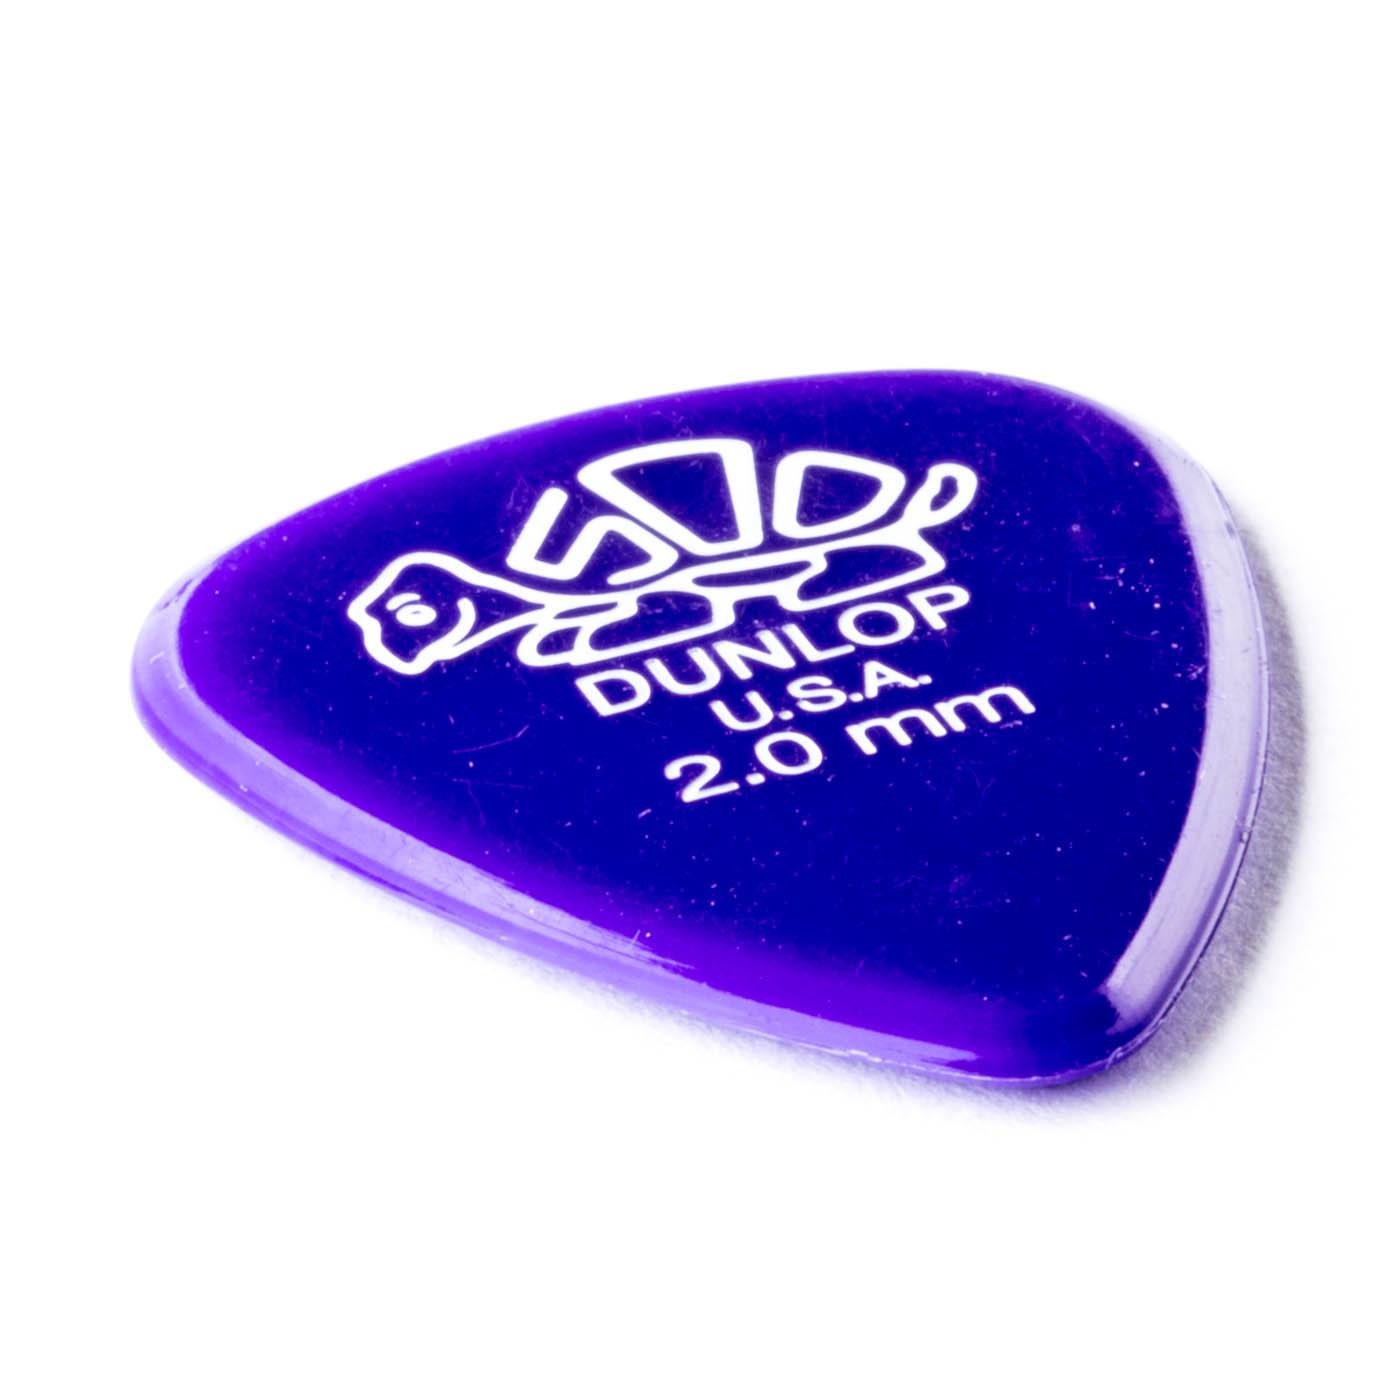 Dunlop - Delrin 500 2,00 dark violet